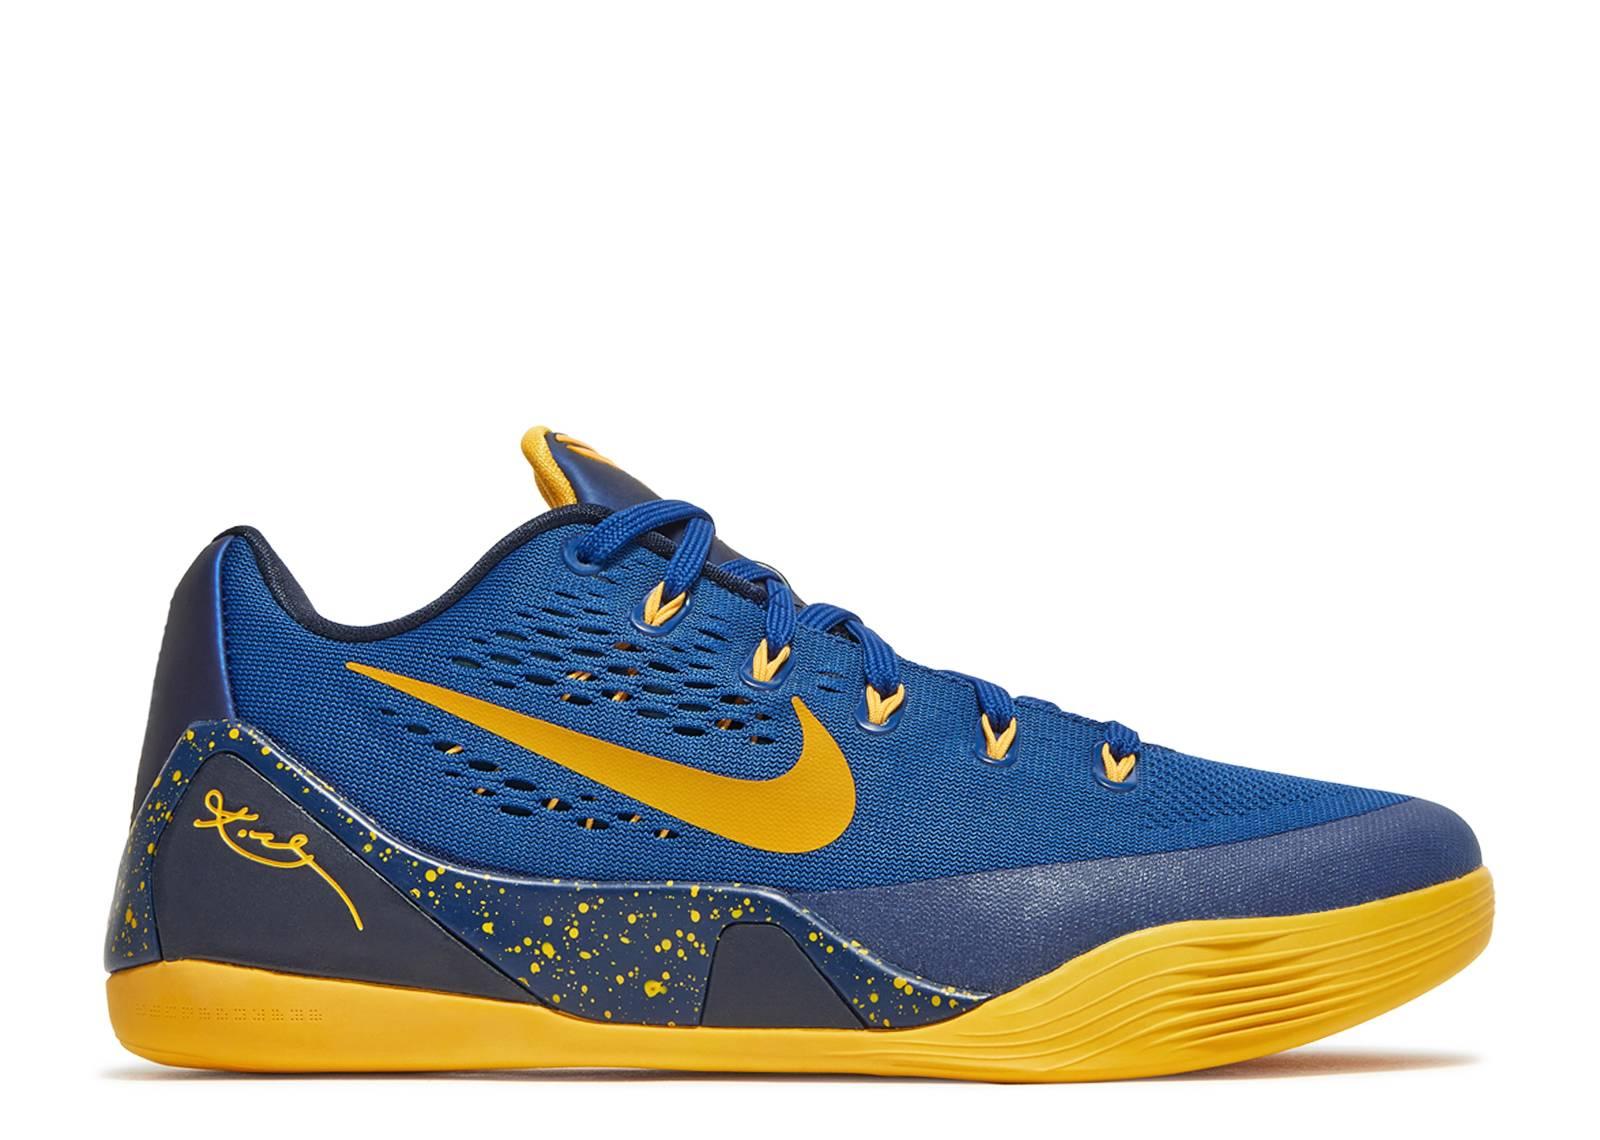 best service 6658c c30e8 Kobe 9 - Nike - 646701 474 - gym blueuniversity gold-obsdn